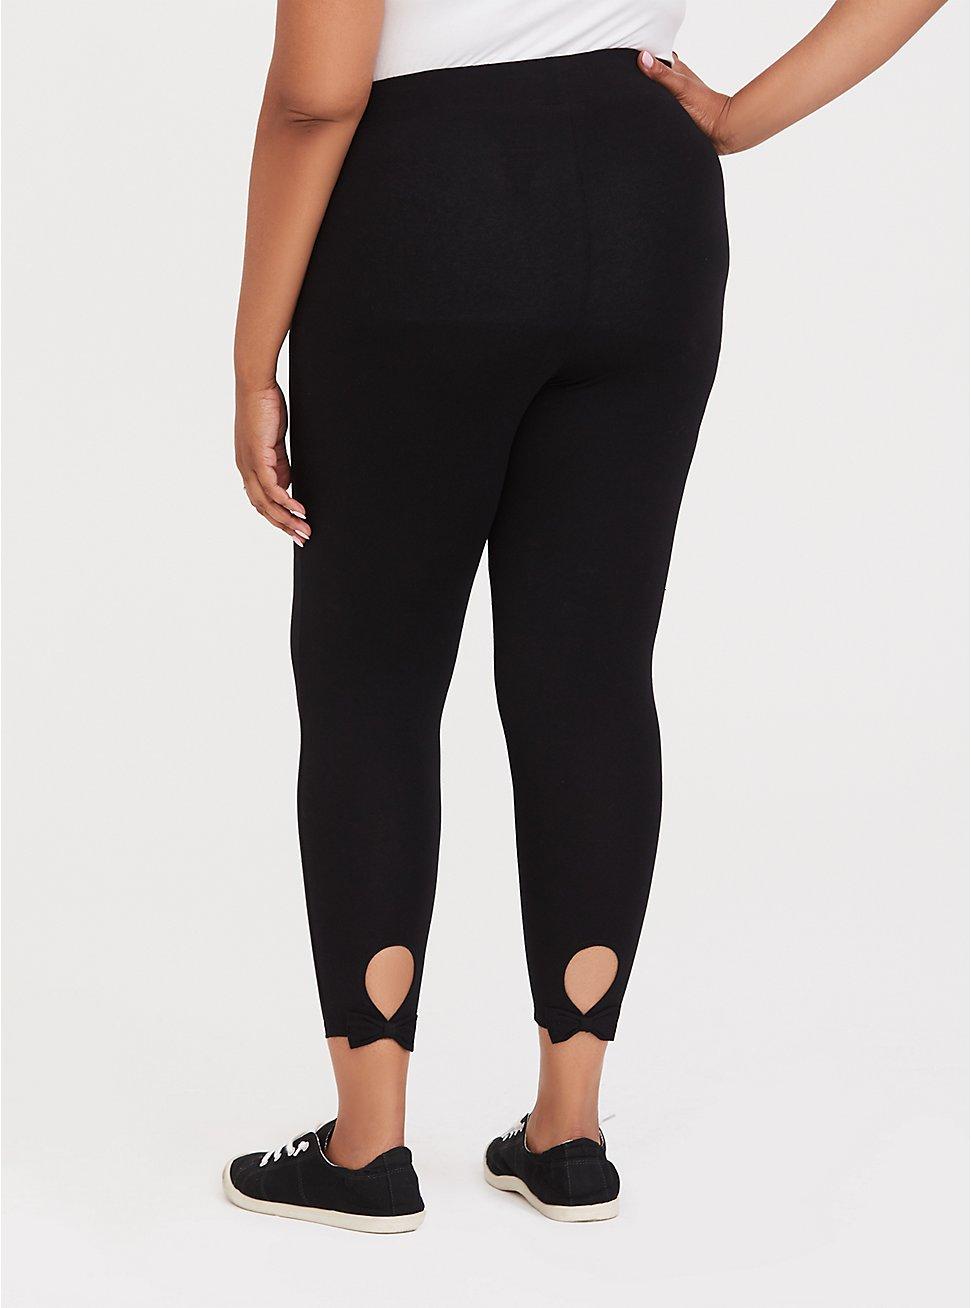 Crop Premium Legging - Back Bow & Keyhole Black, BLACK, hi-res